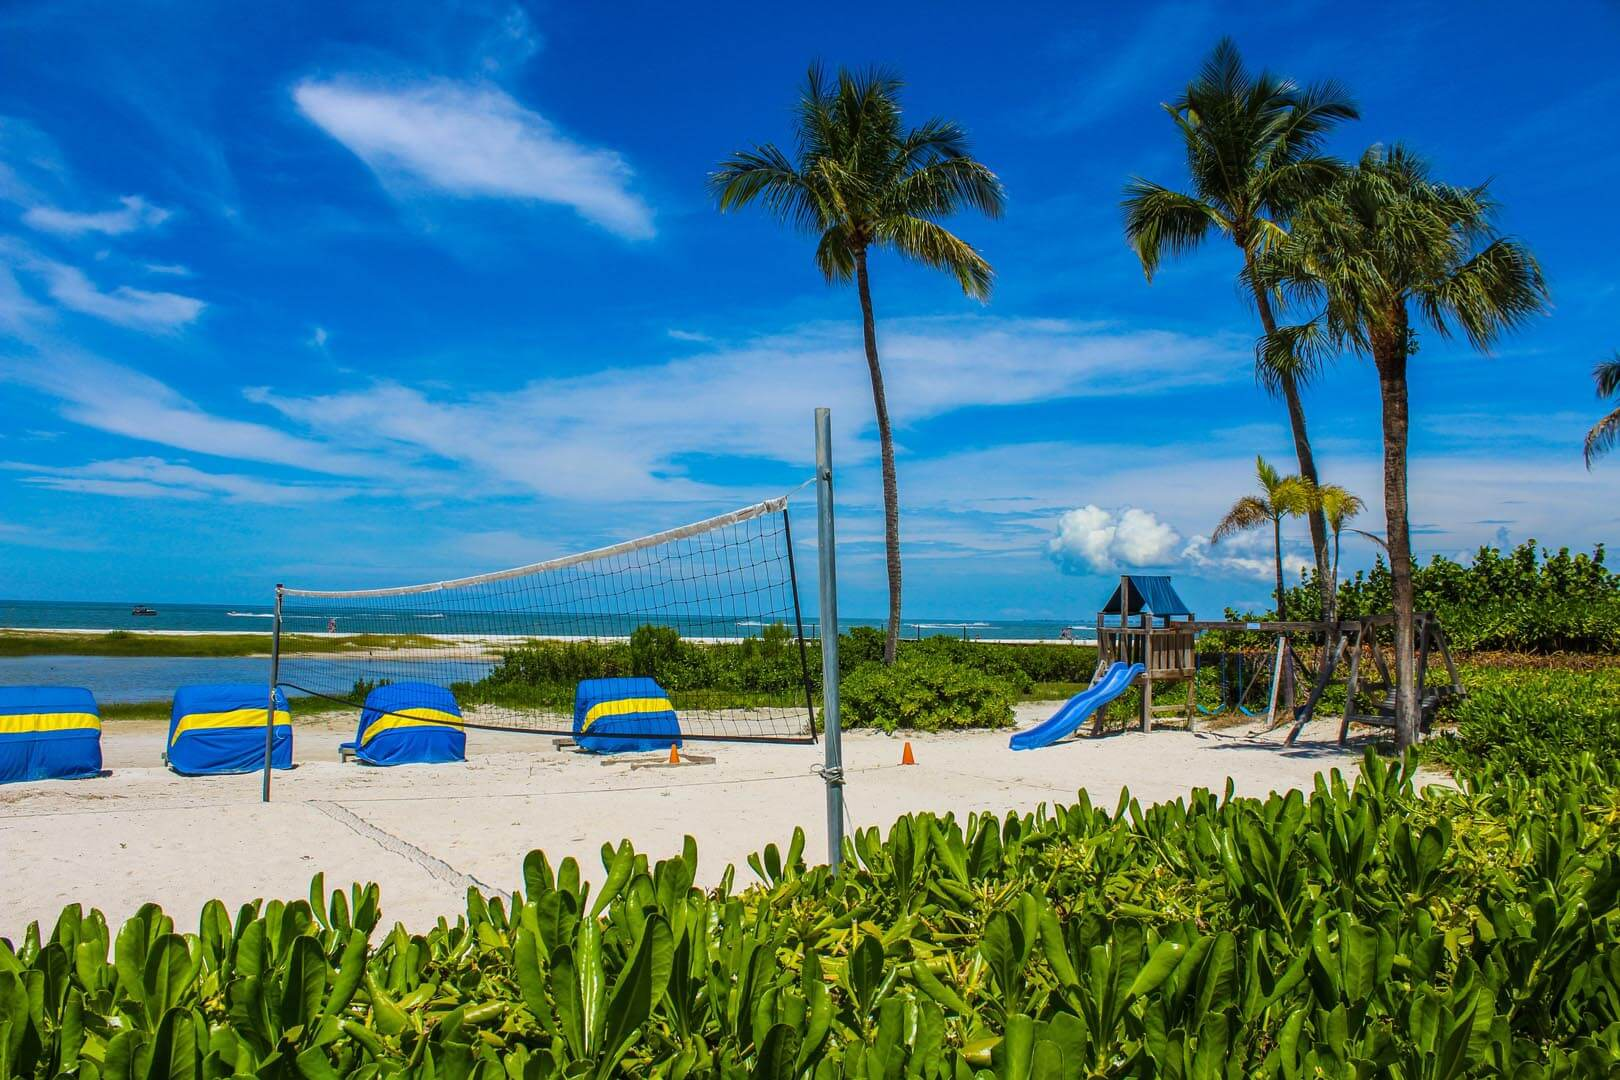 Mariner's Boathouse - Beach - Volleyball - Playground